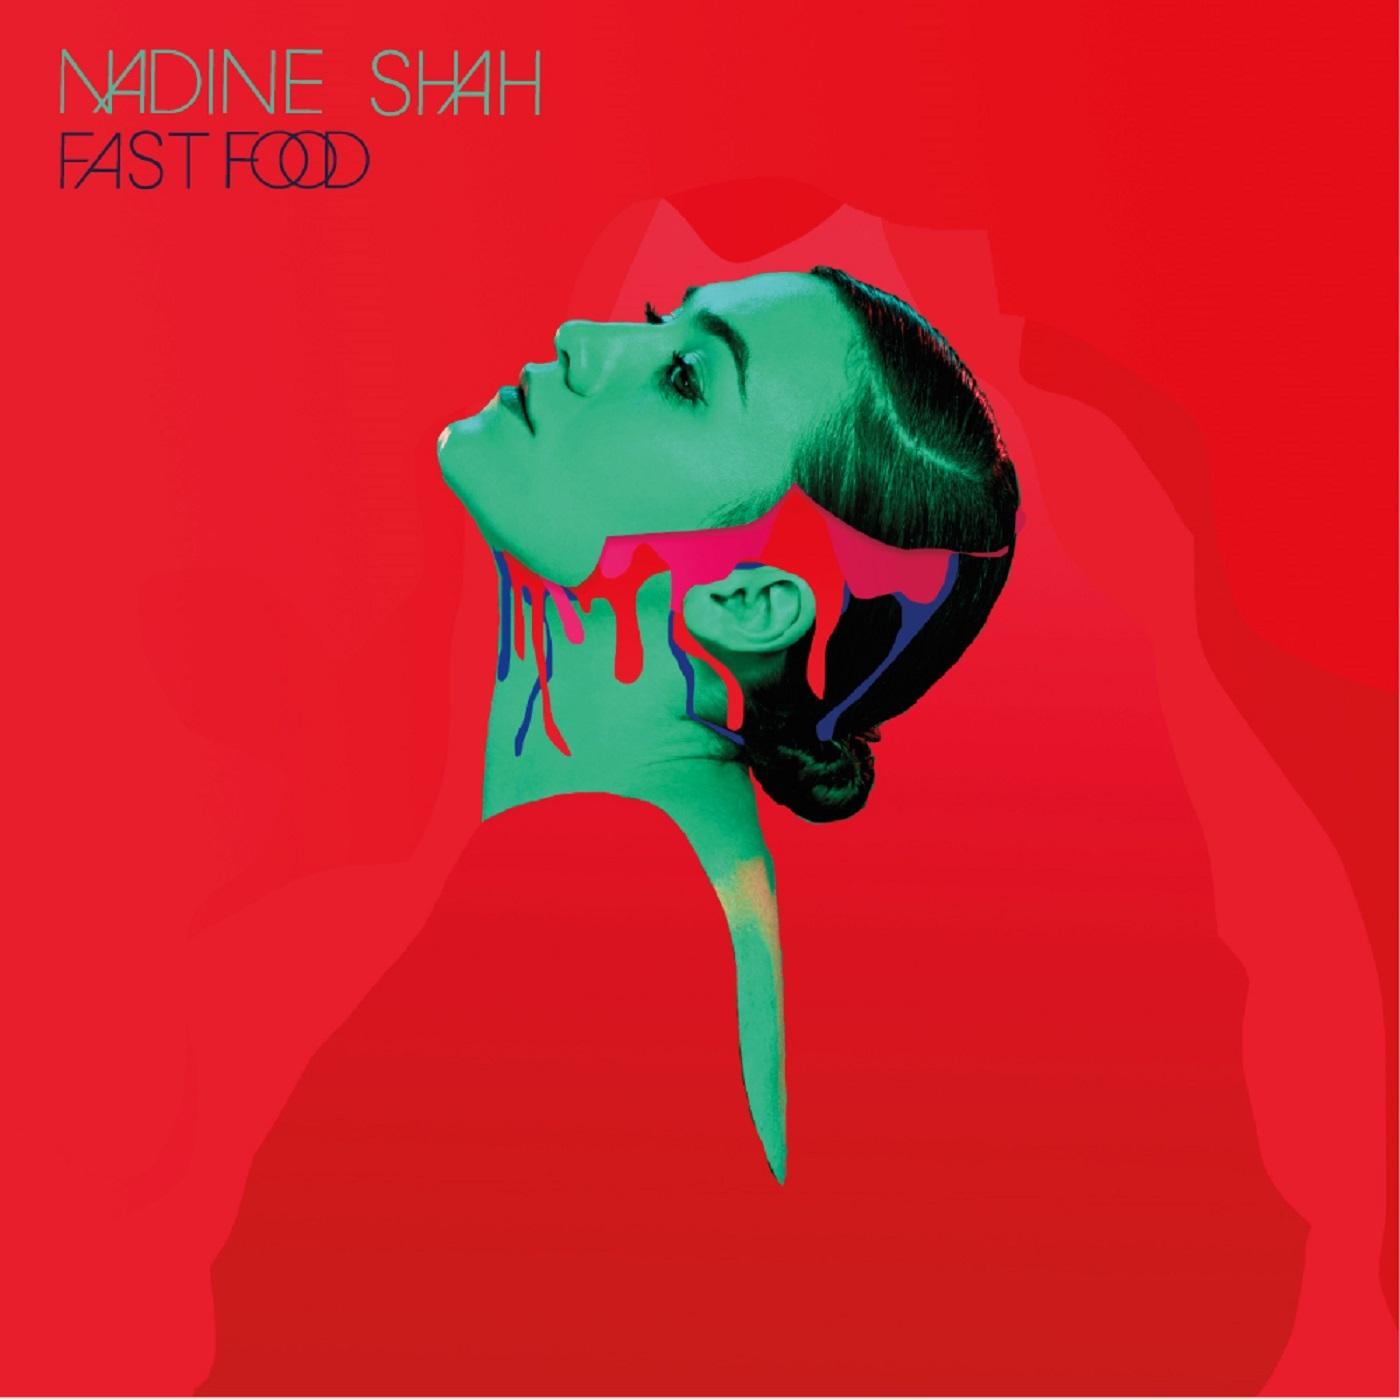 Nadine_Shah_Fast_Food_Albumcover.jpg